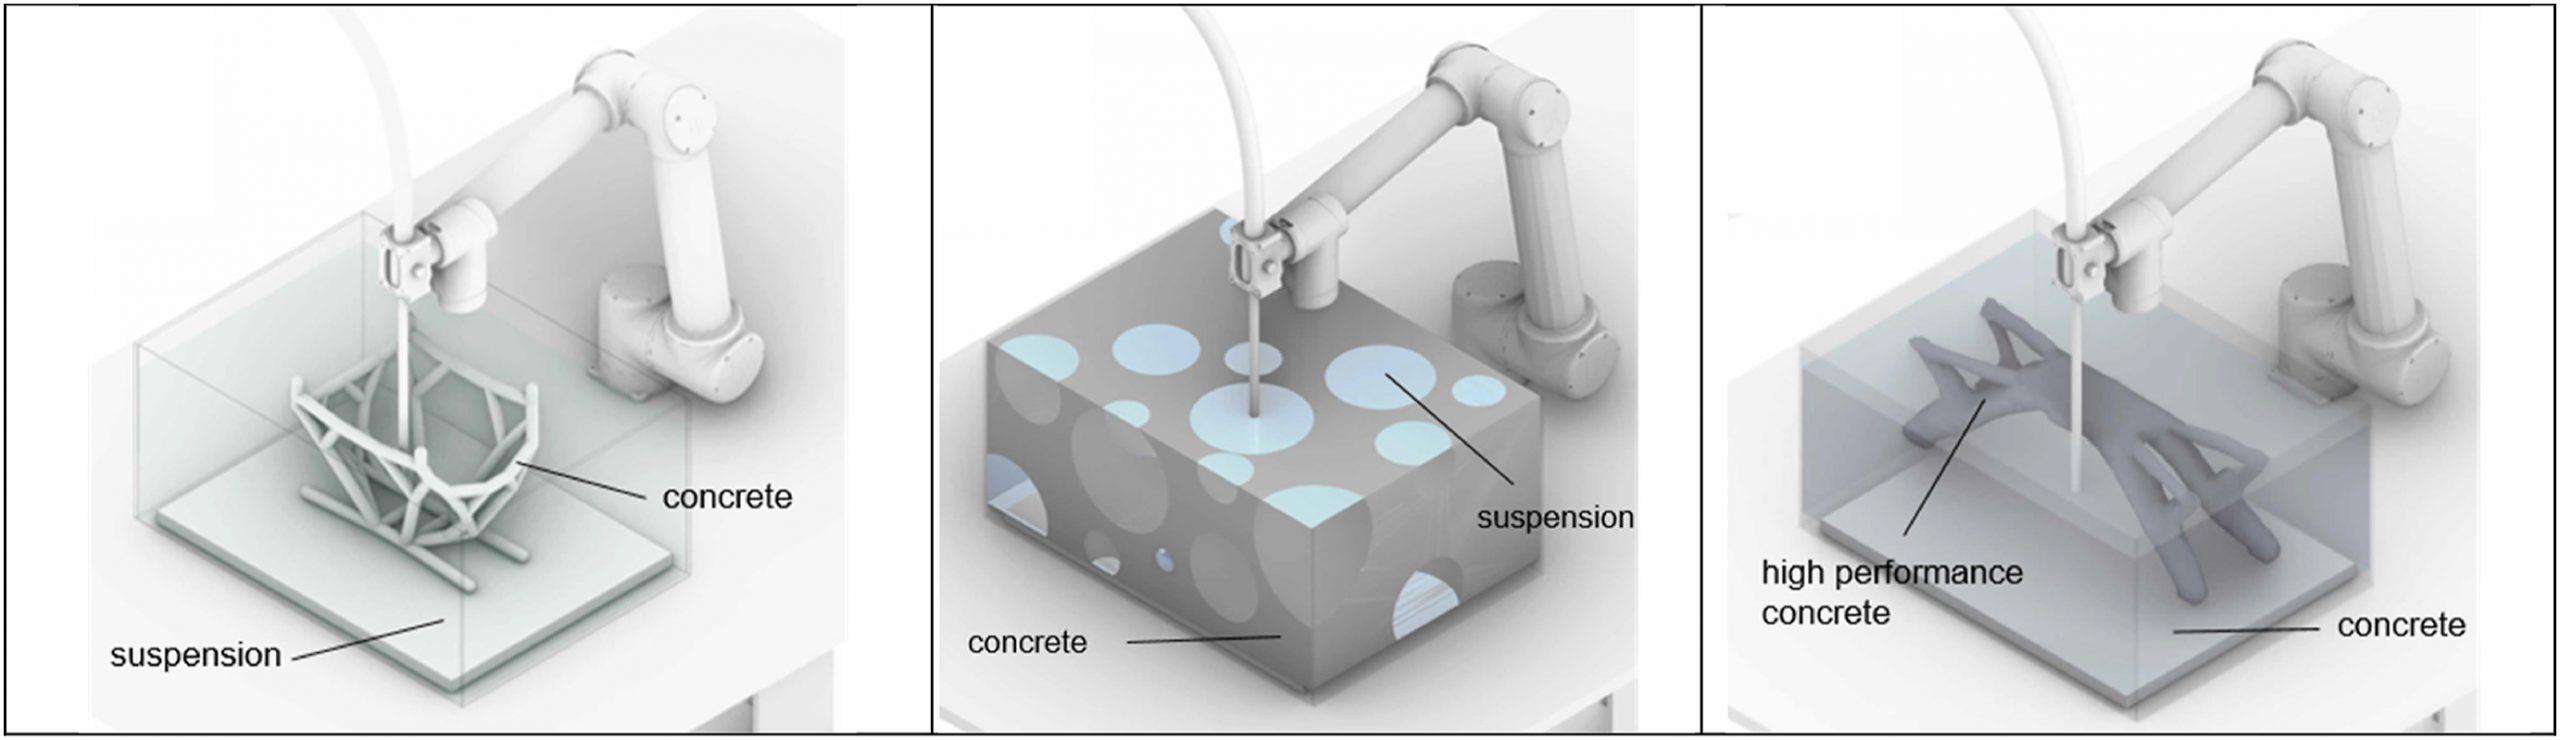 Injection 3D Concrete Printing processes: (a) Concrete in Suspension, (b) Suspension in Concrete, (c) Concrete in Concrete. Image via TU Braunschweig.